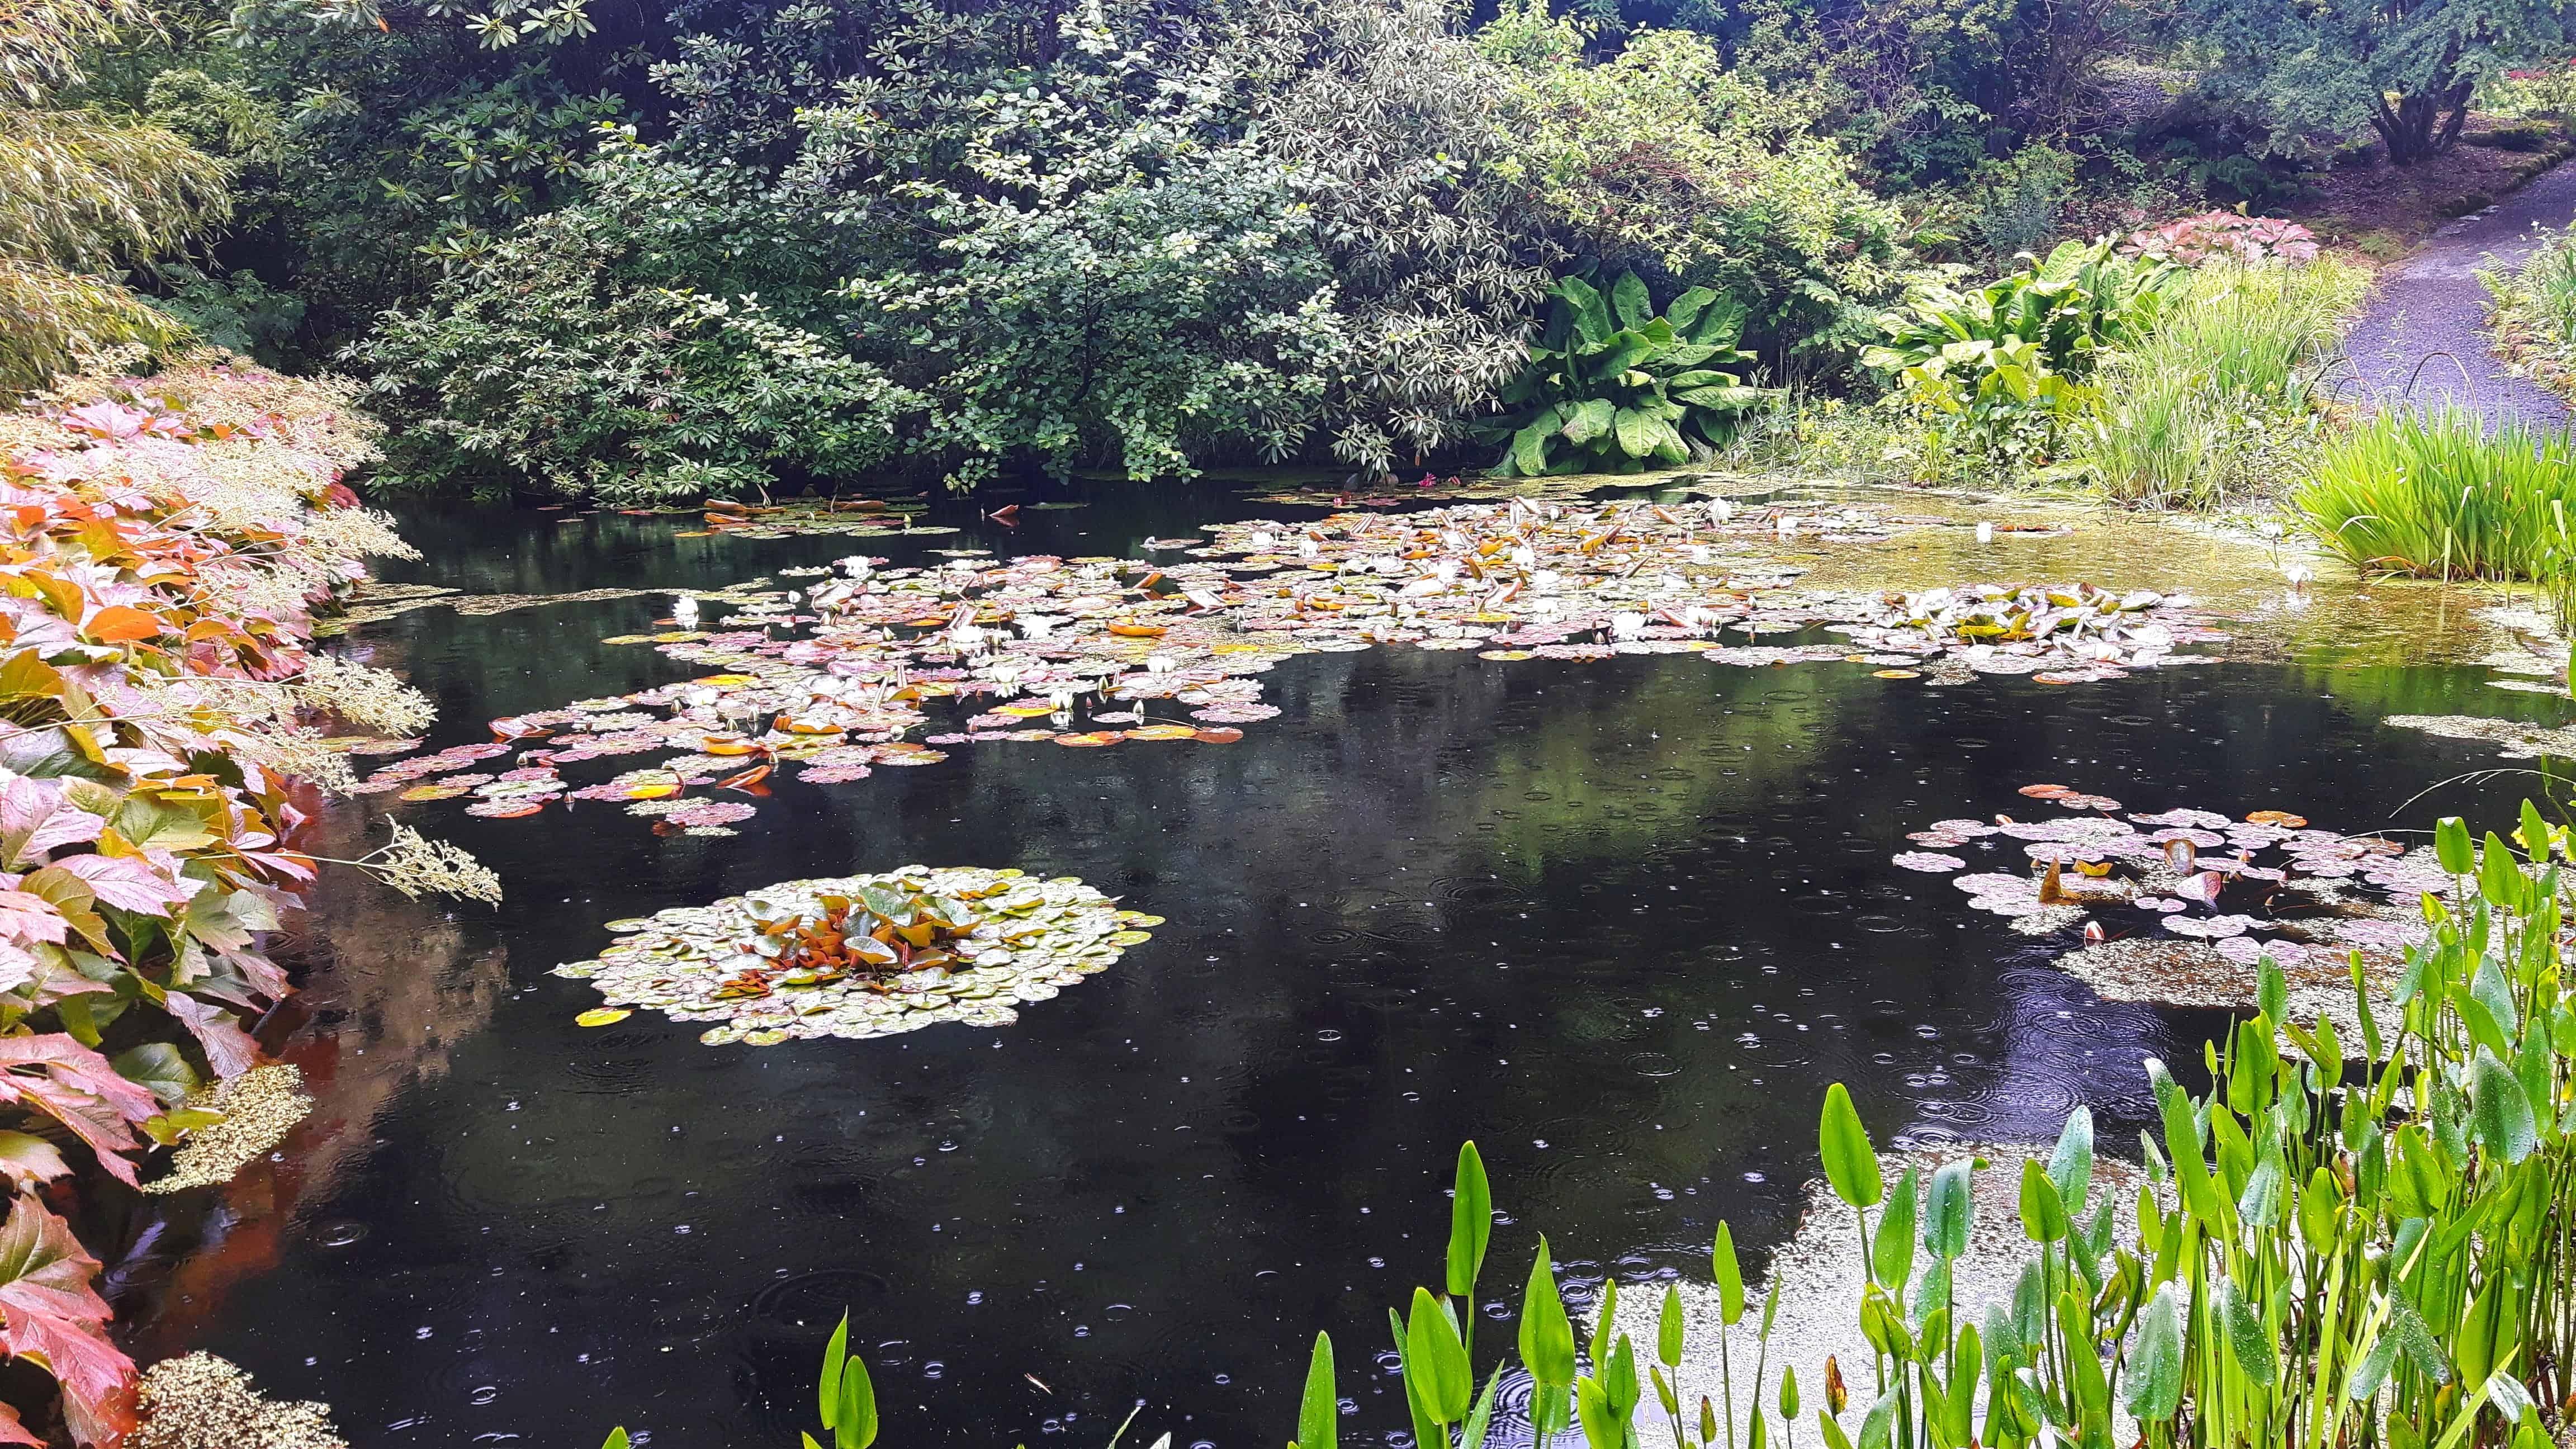 Septemberwaldherbstmorgen – die zweite Strophe